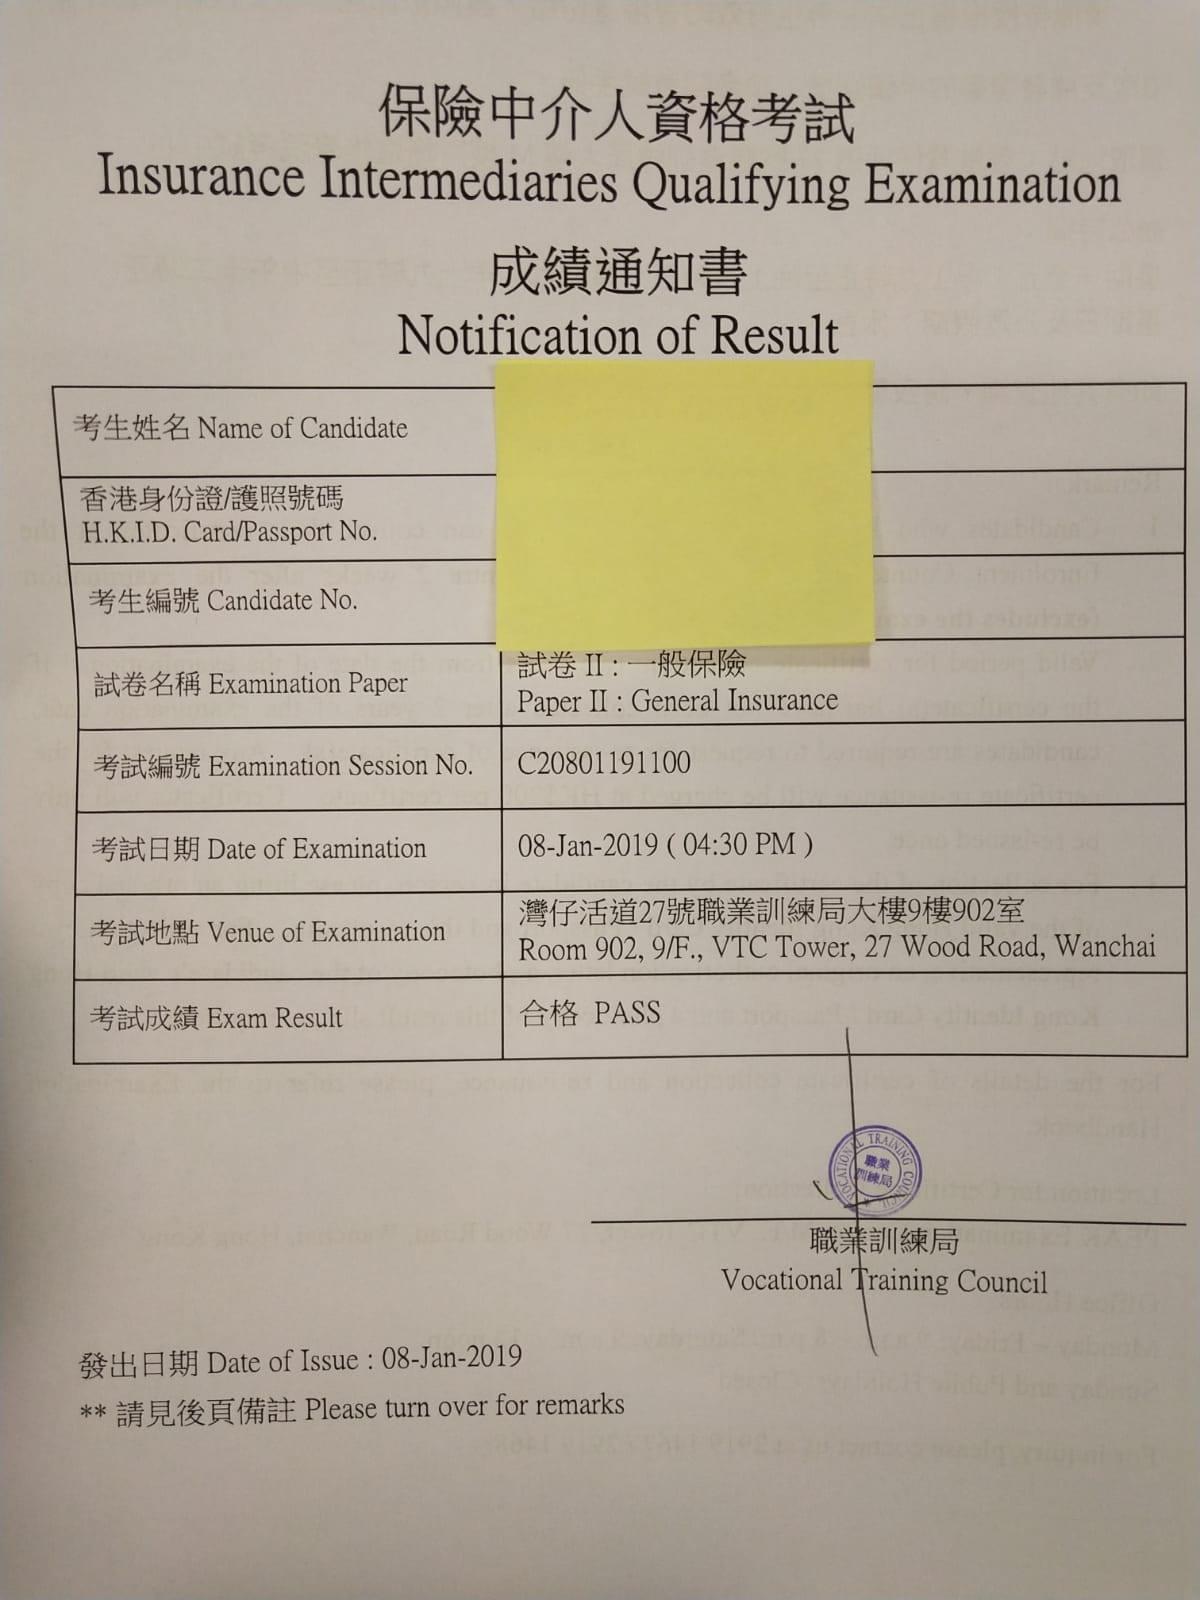 YWAT 8/1/2019 IIQE Paper 2 保險中介人資格考試卷二 Pass